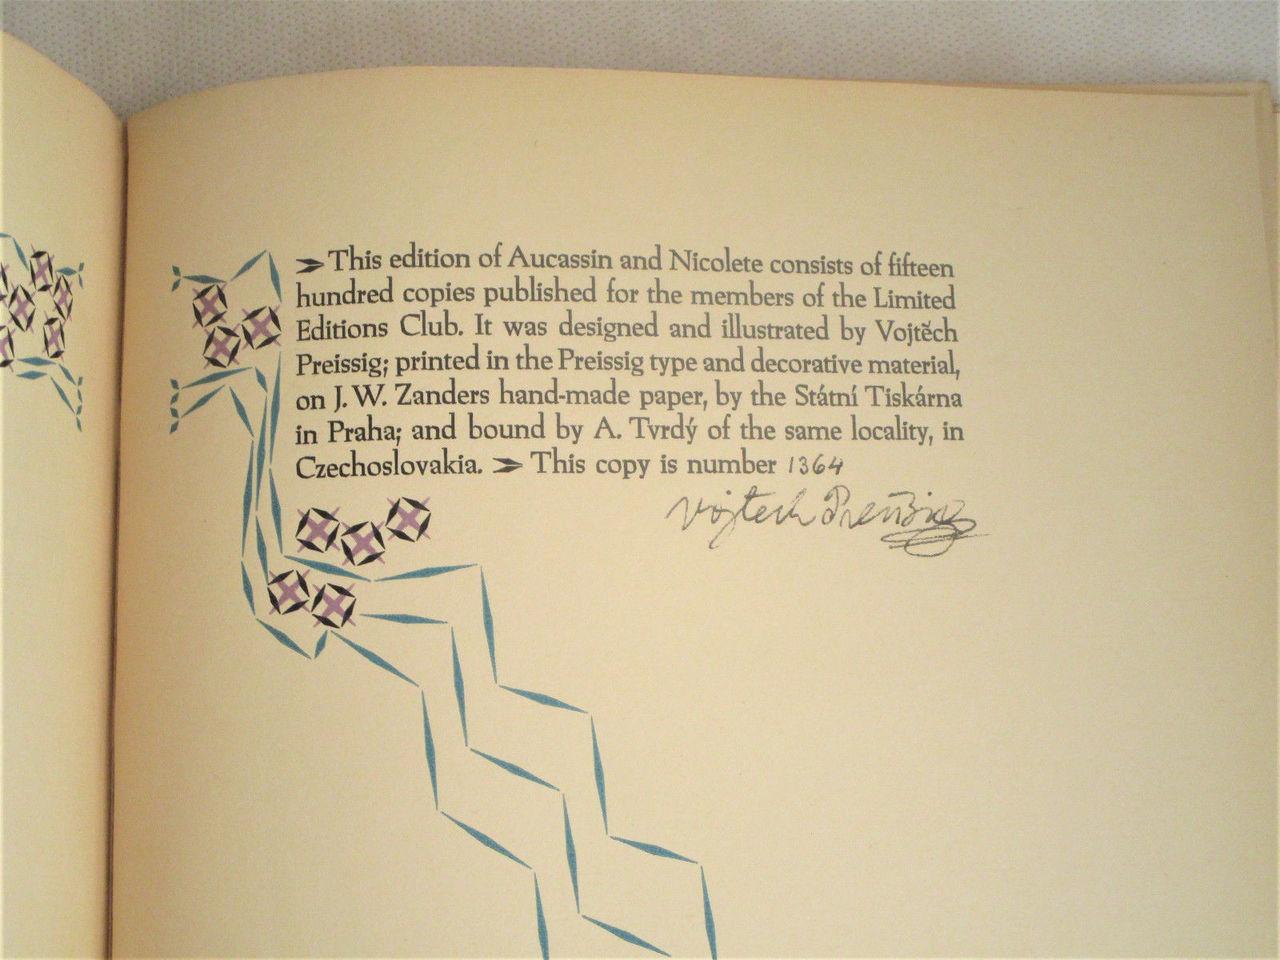 AUCASSIN & NICOLETE, by Vojtech Preissig & Andrew Lang - 1931 [Signed Ltd Ed]